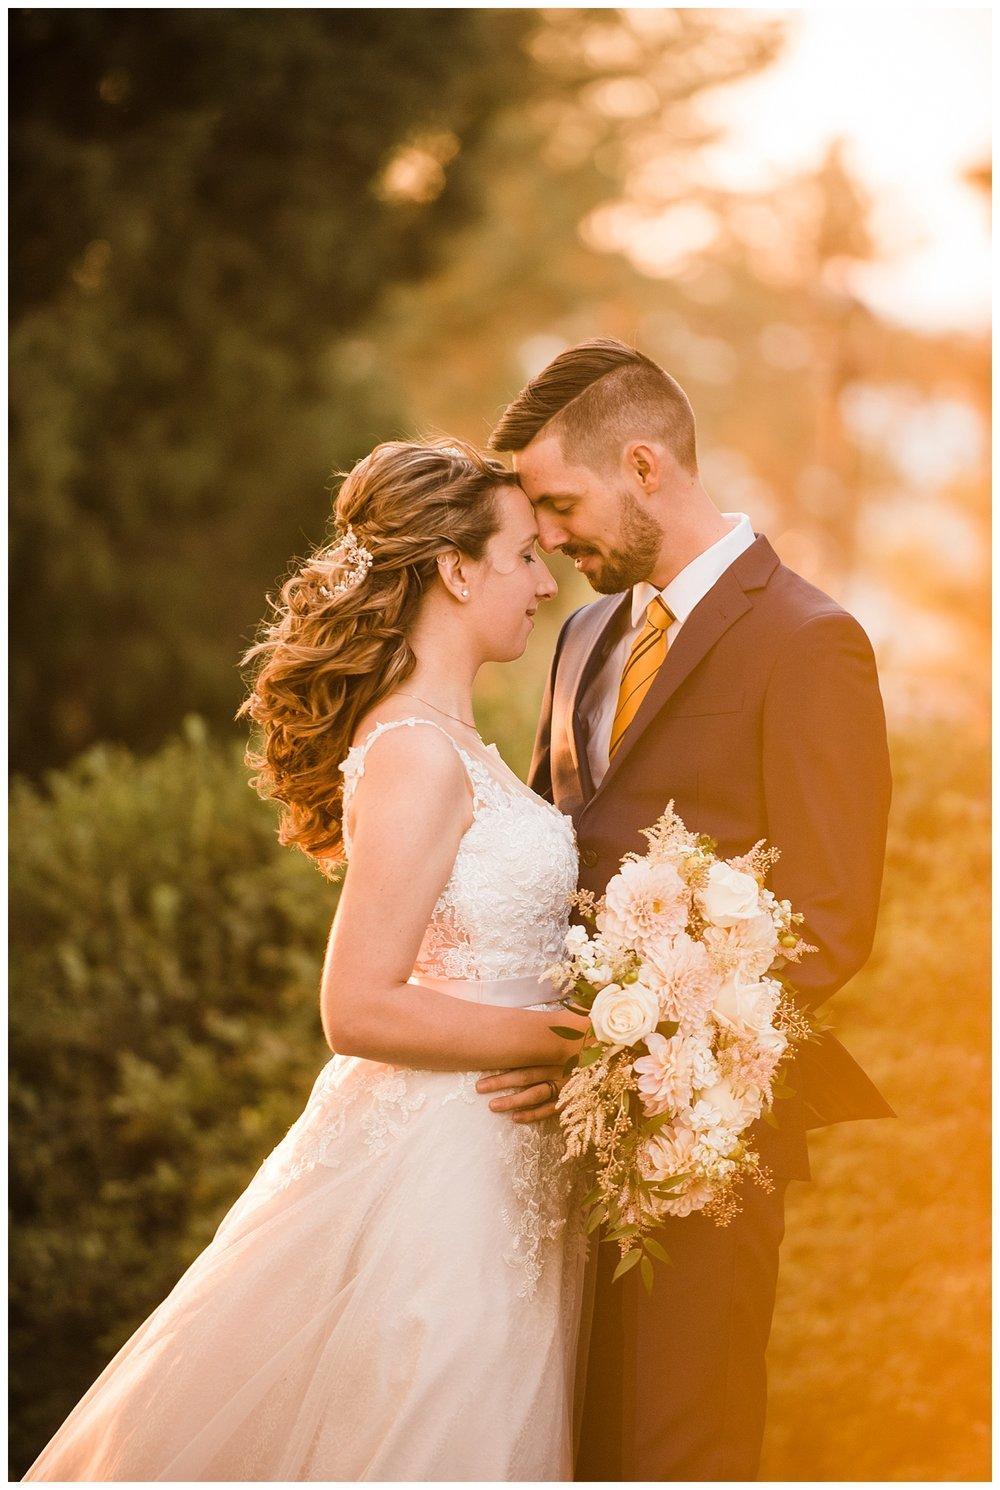 Highlands_Ranch_Mansion_Colorado_Wedding_Photographer_Harry_Potter_Themed_Weddings_Apollo_Fields_027.jpg